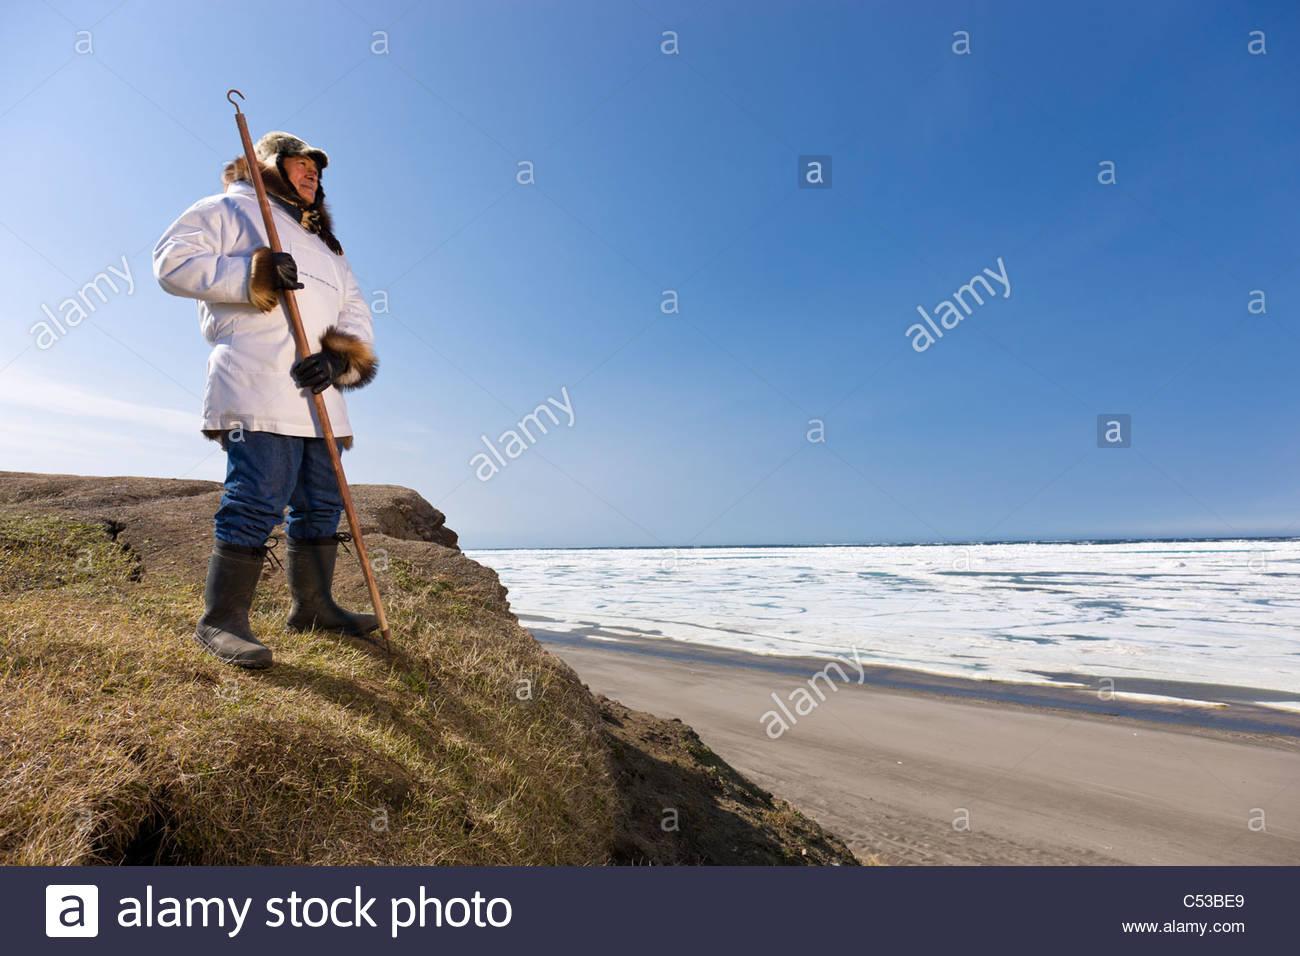 Inupiaq Eskimo holding a walking stick at Old Utkeagvik original town site overlooking the Chukchi Sea, Barrow, - Stock Image